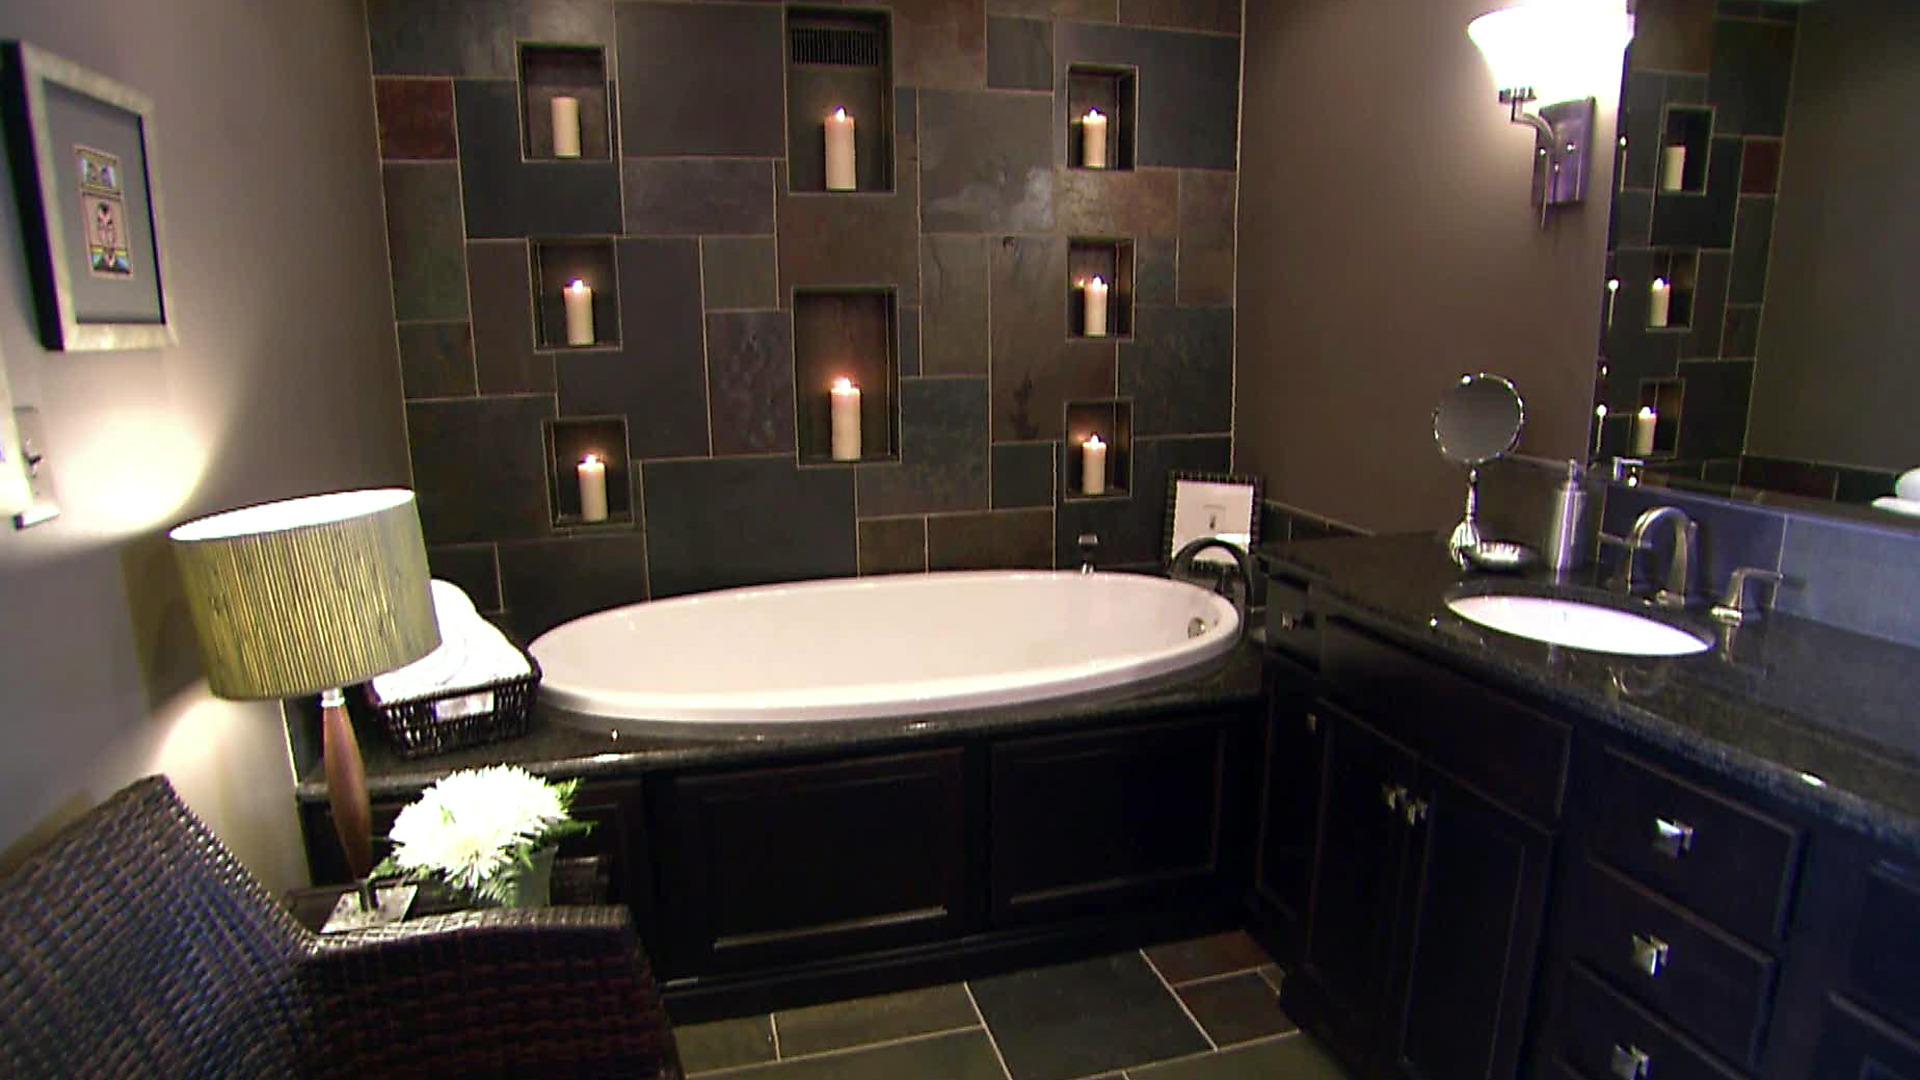 Bathroom Renovator bathroom renovations how to choose a quality bathroom renovator